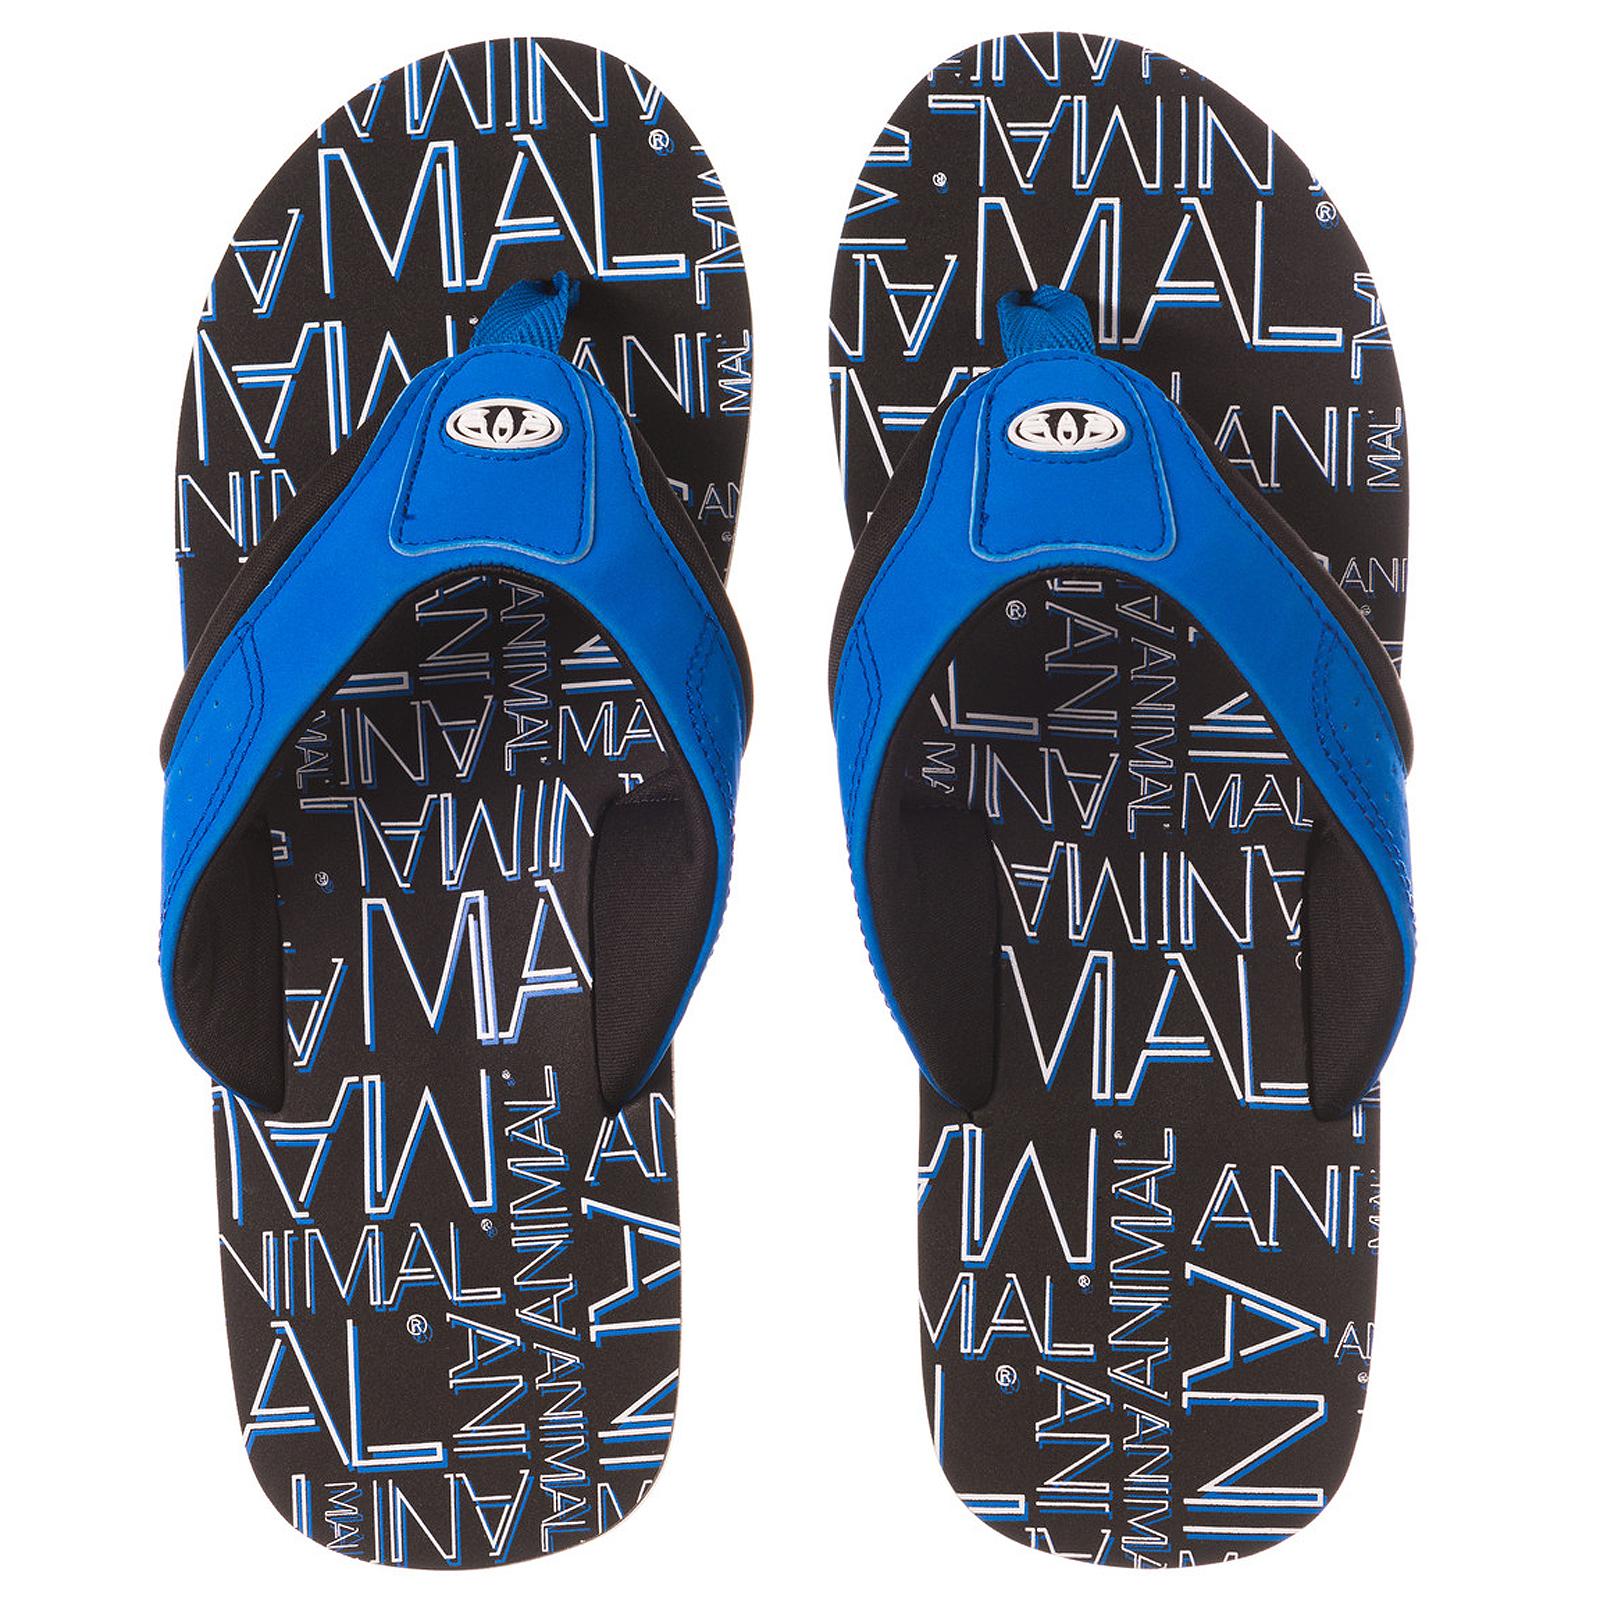 Animal Mens Jekyl Logo Summer Beach Holiday Sandals Flip Flops Black  Blue